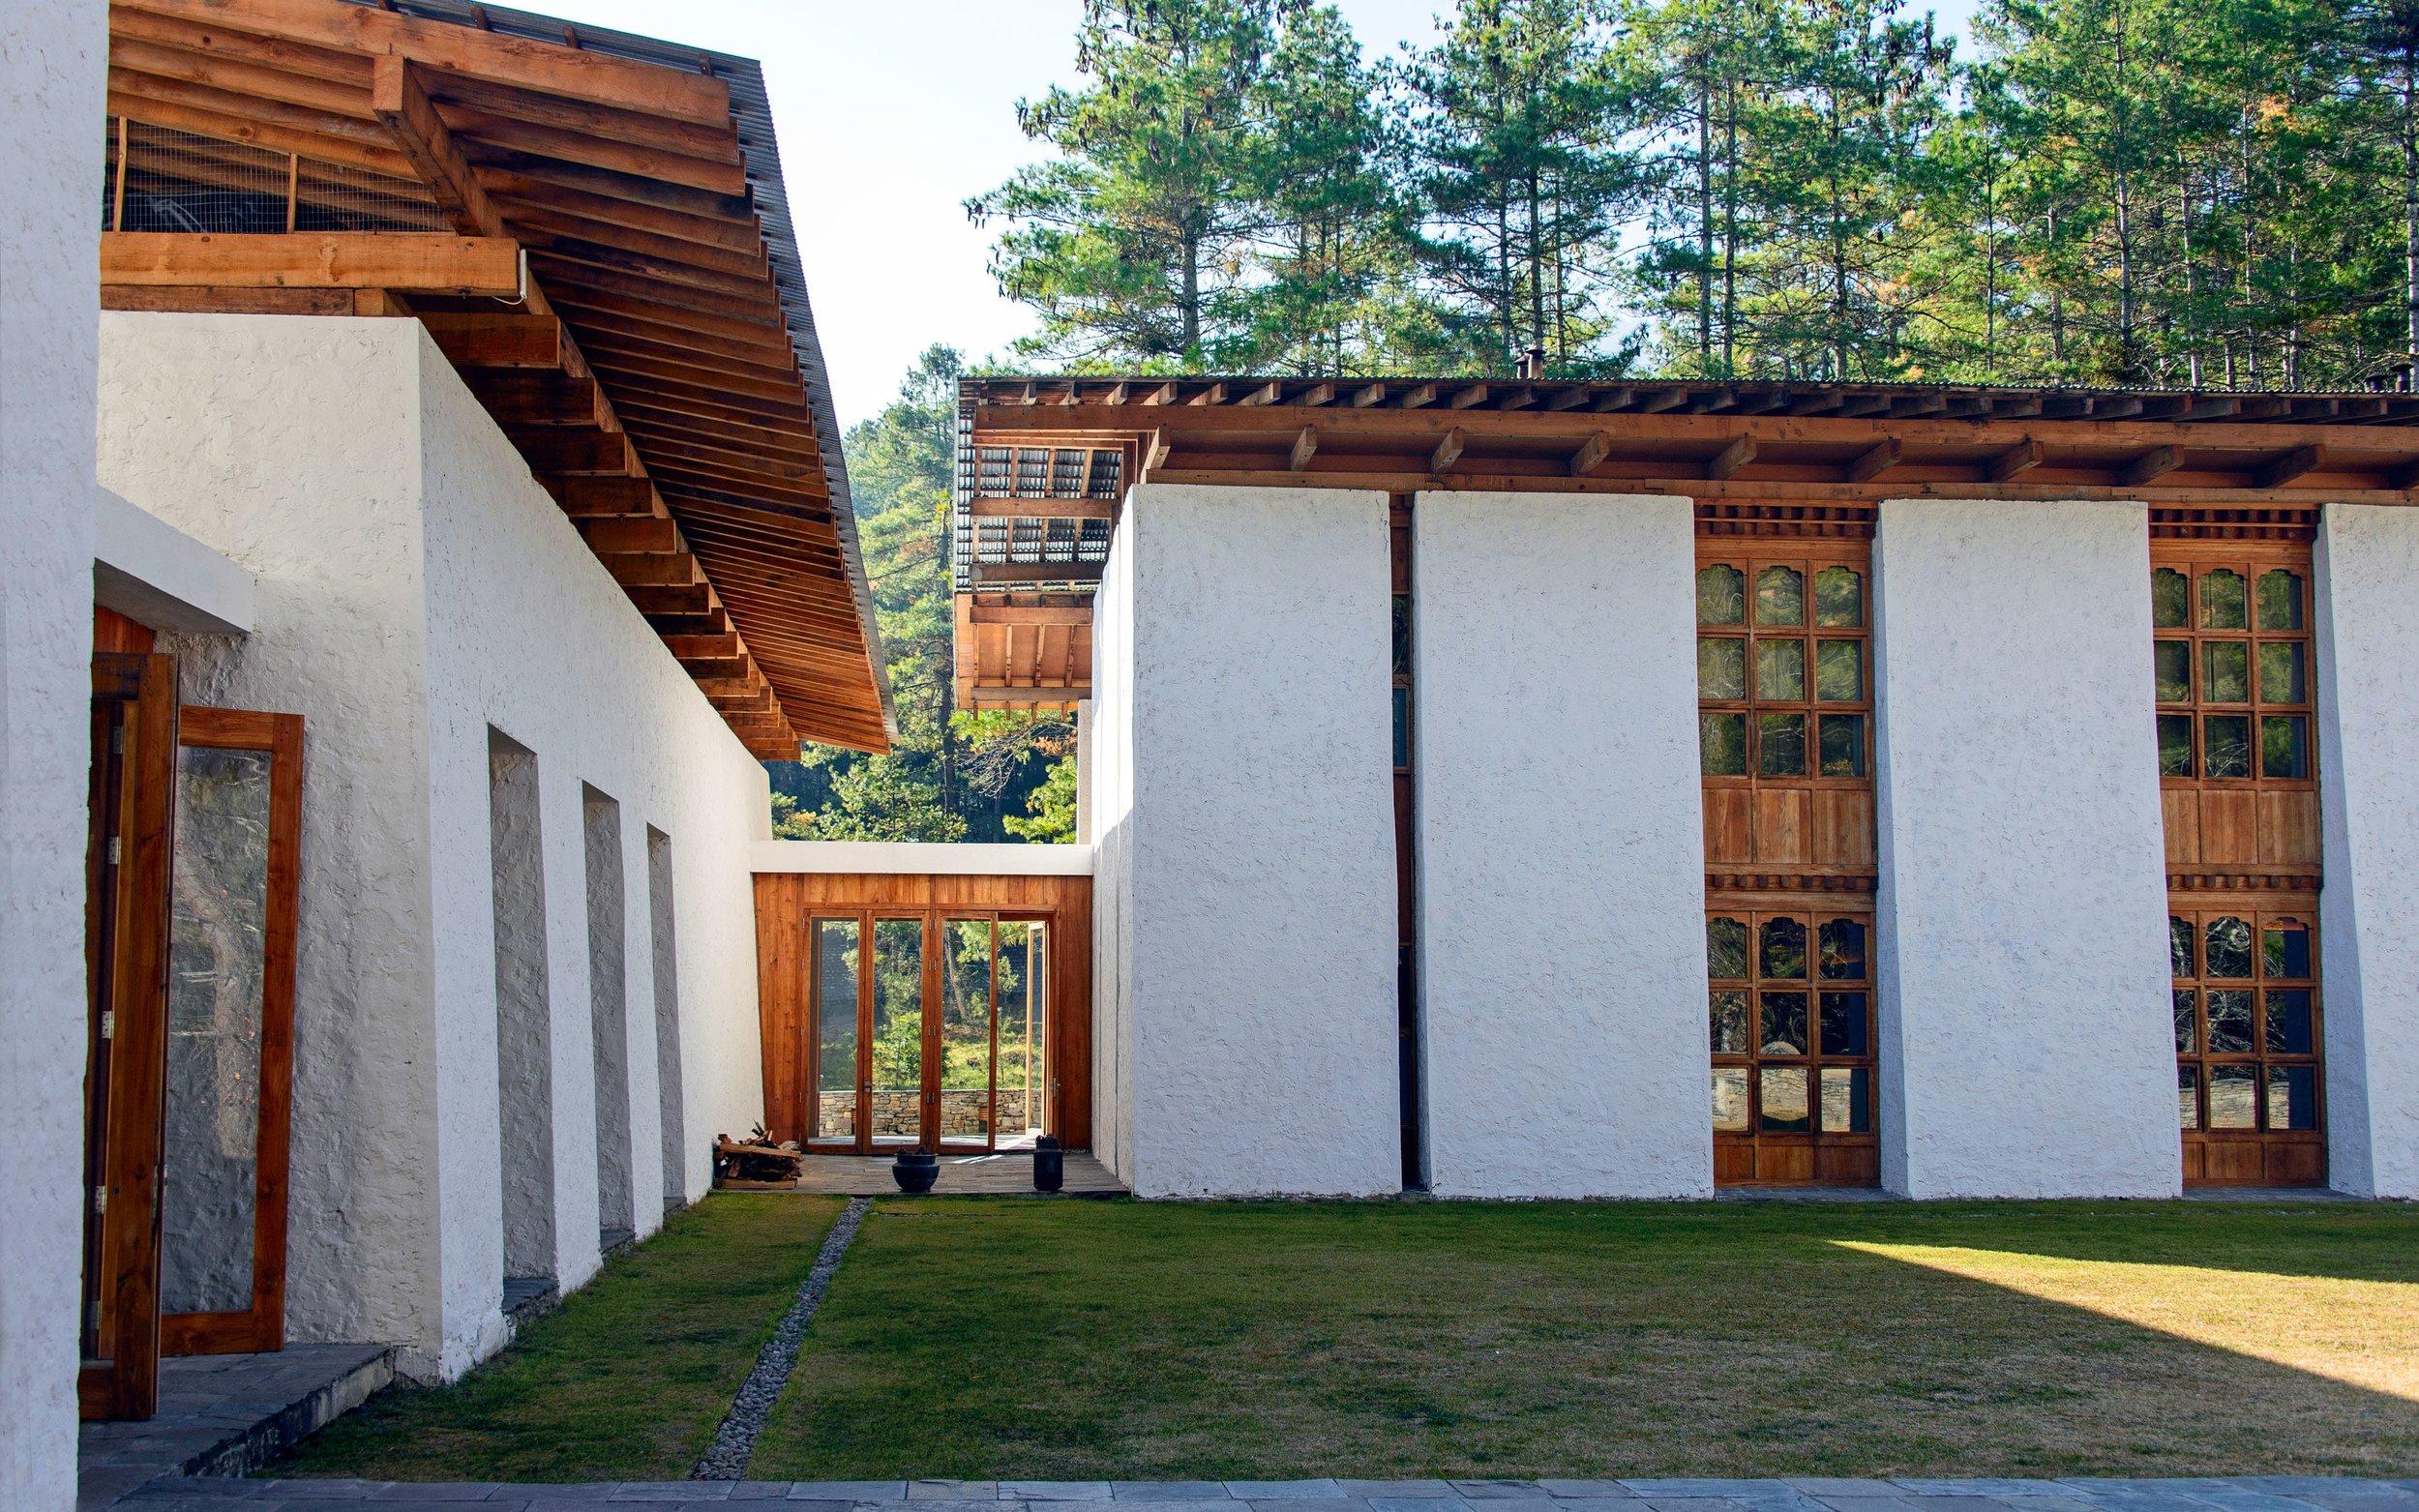 amankora-thimphu-bhutan-exterior2.jpg